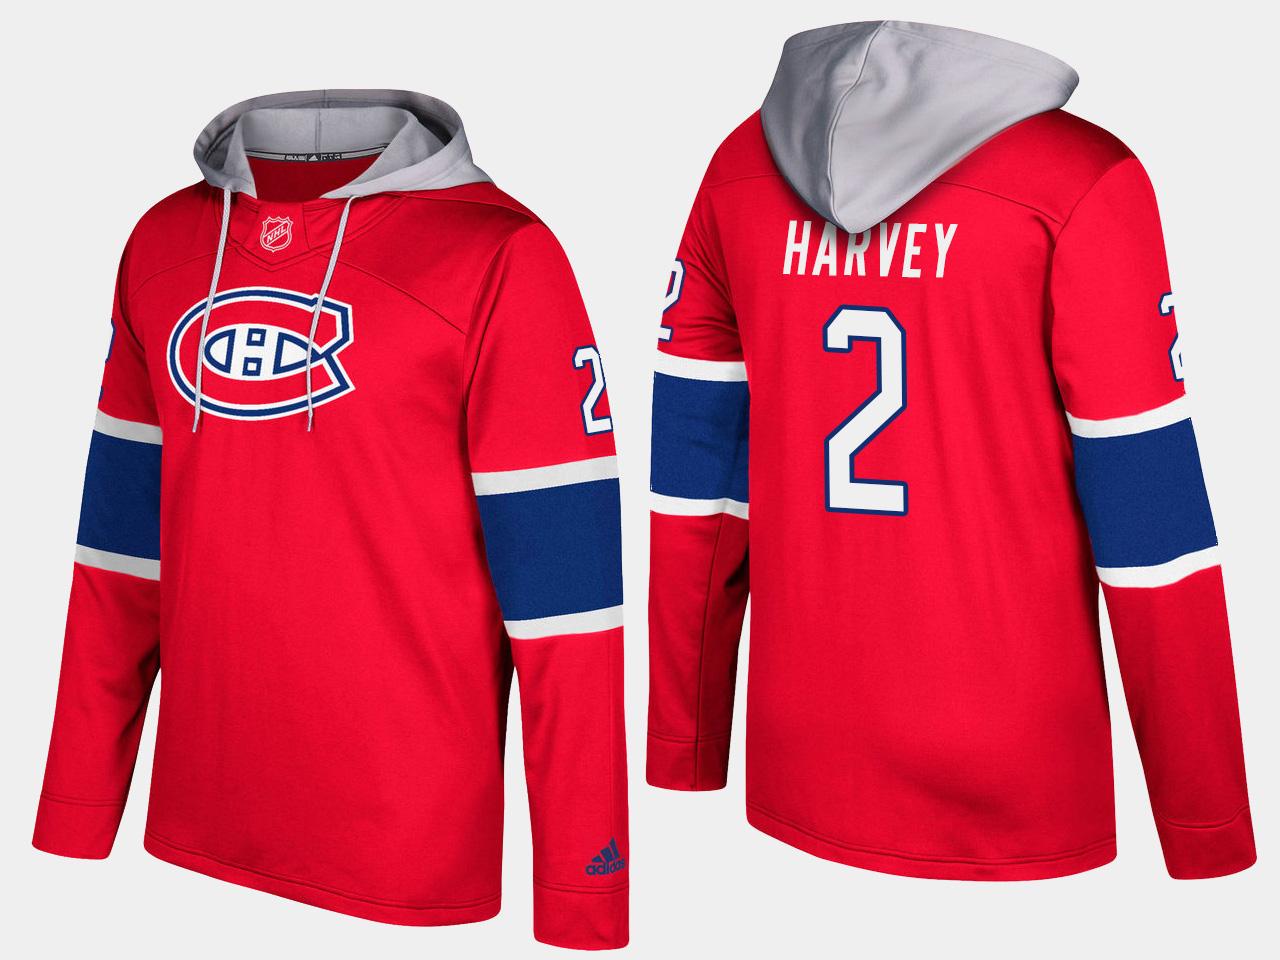 Canadiens #2 Doug Harvey Red Name And Number Hoodie